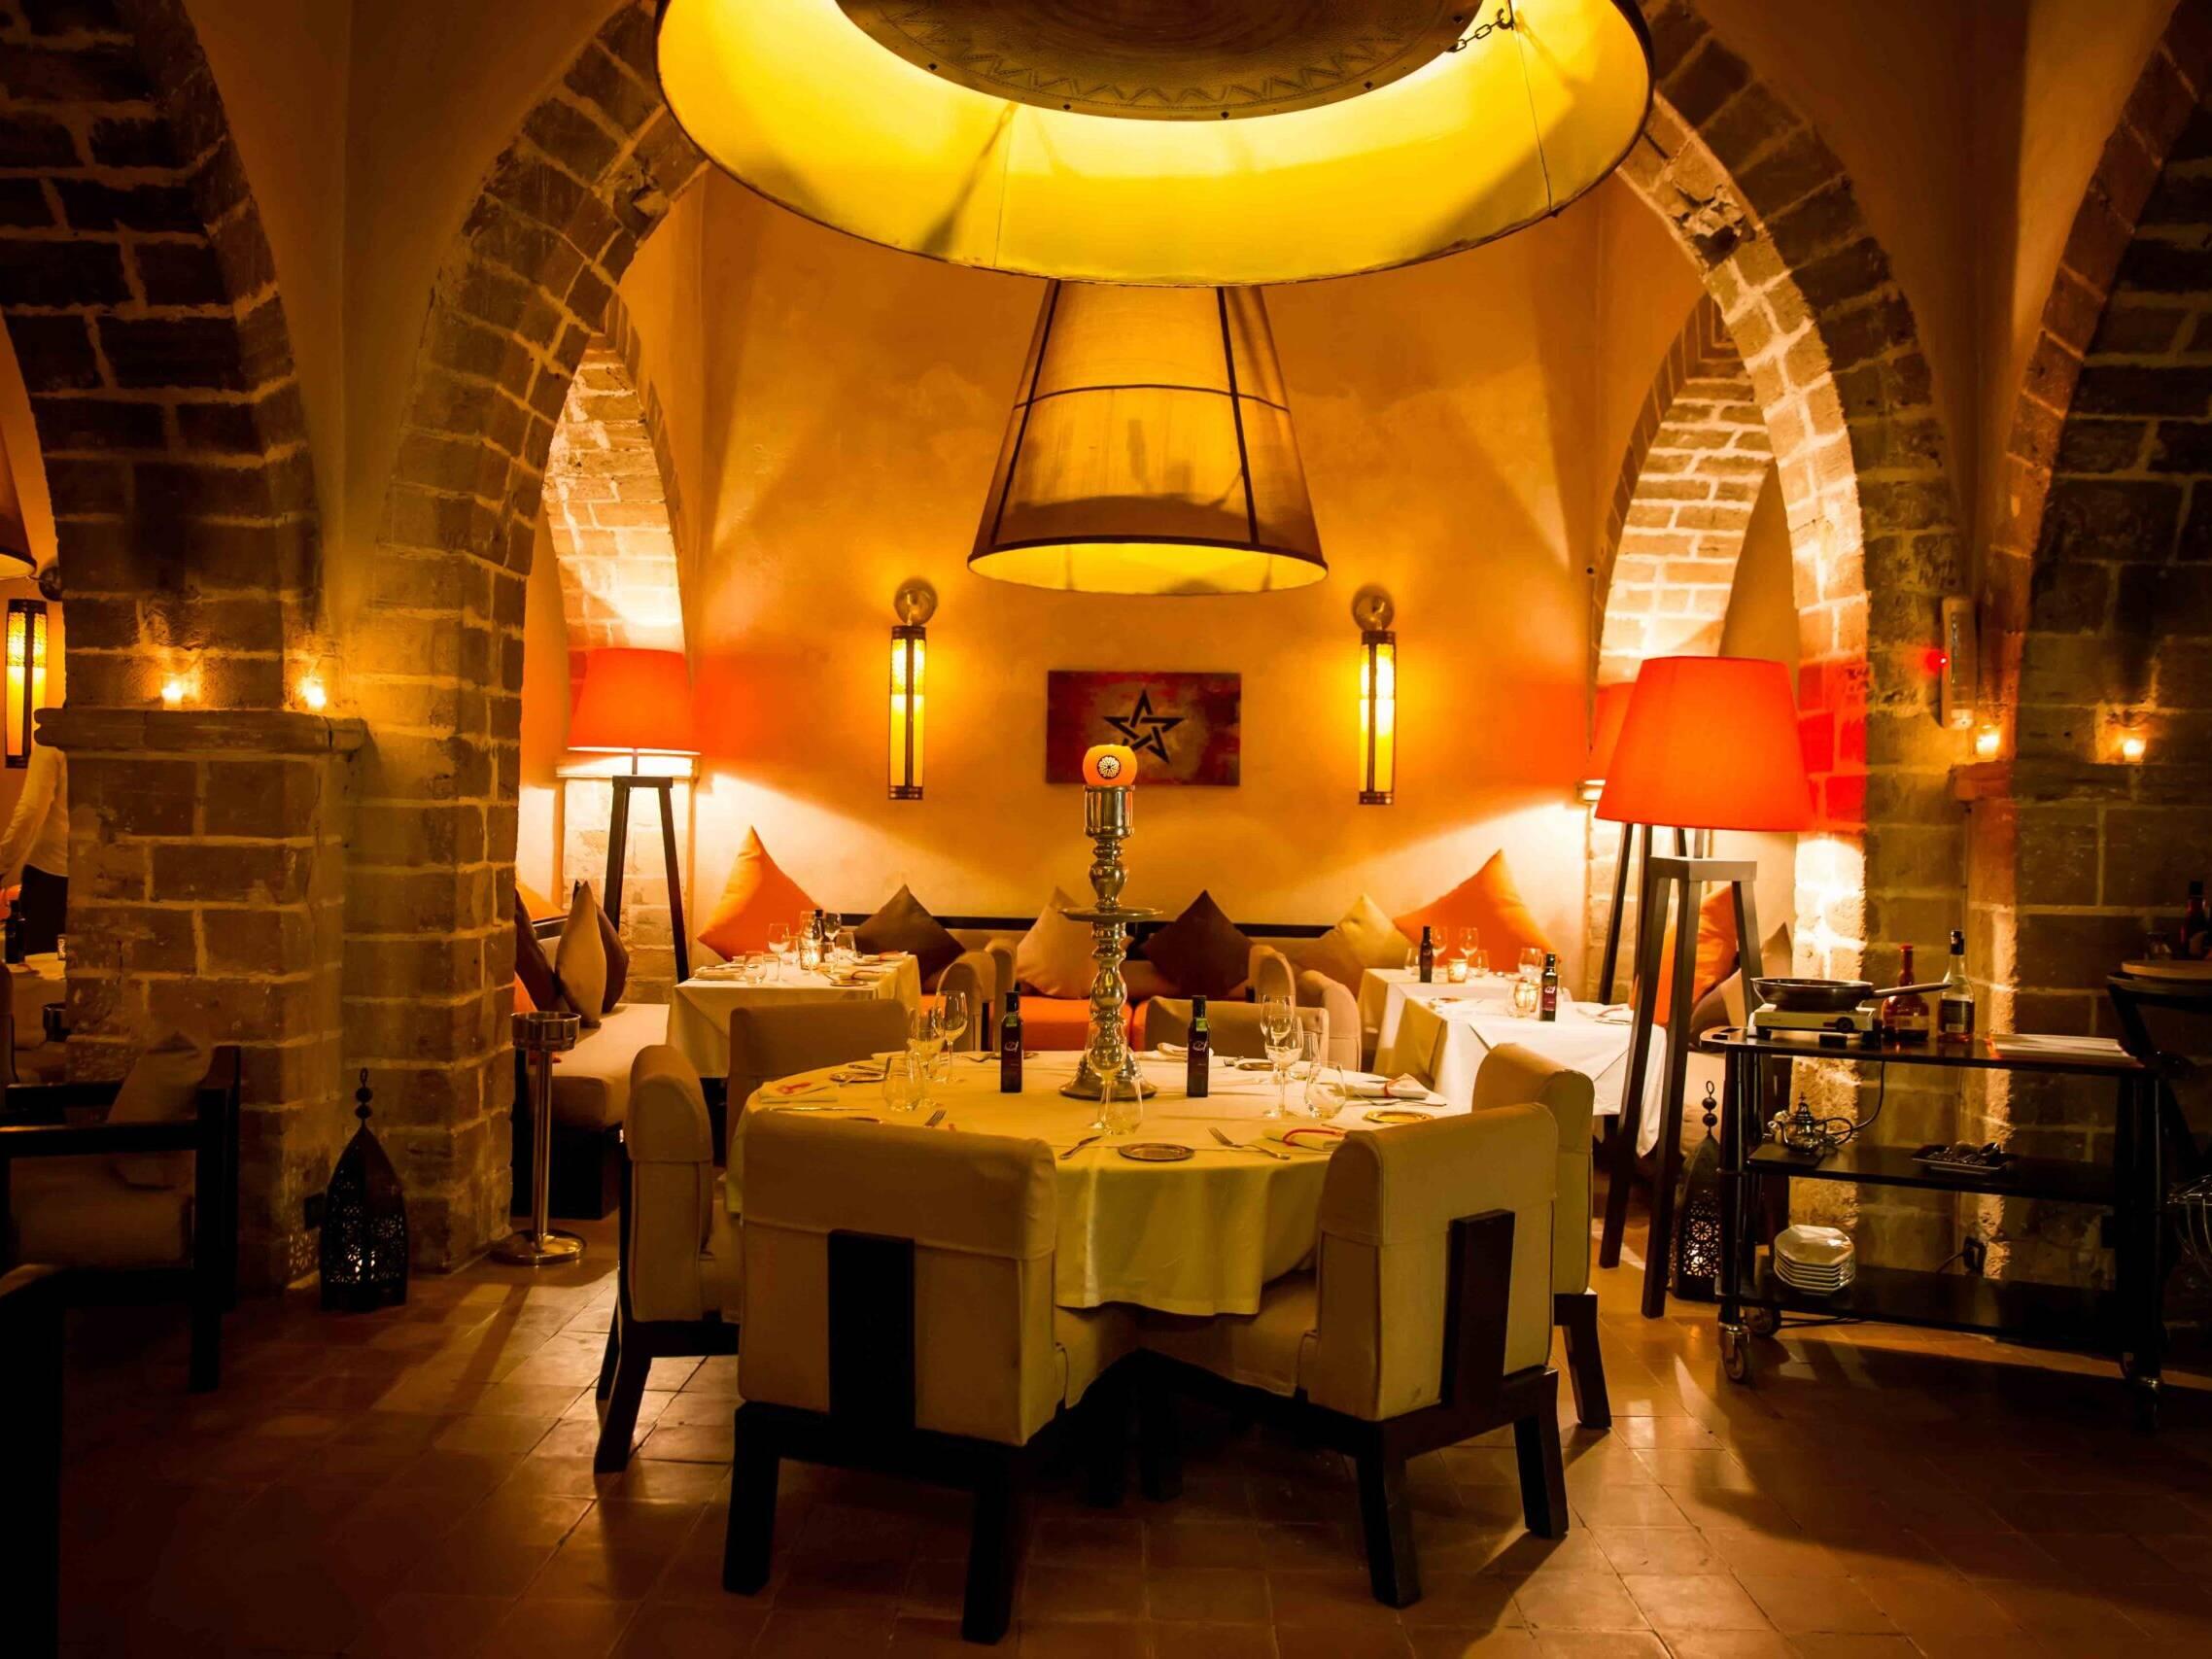 Madada restaurant in Essaouira Morocco